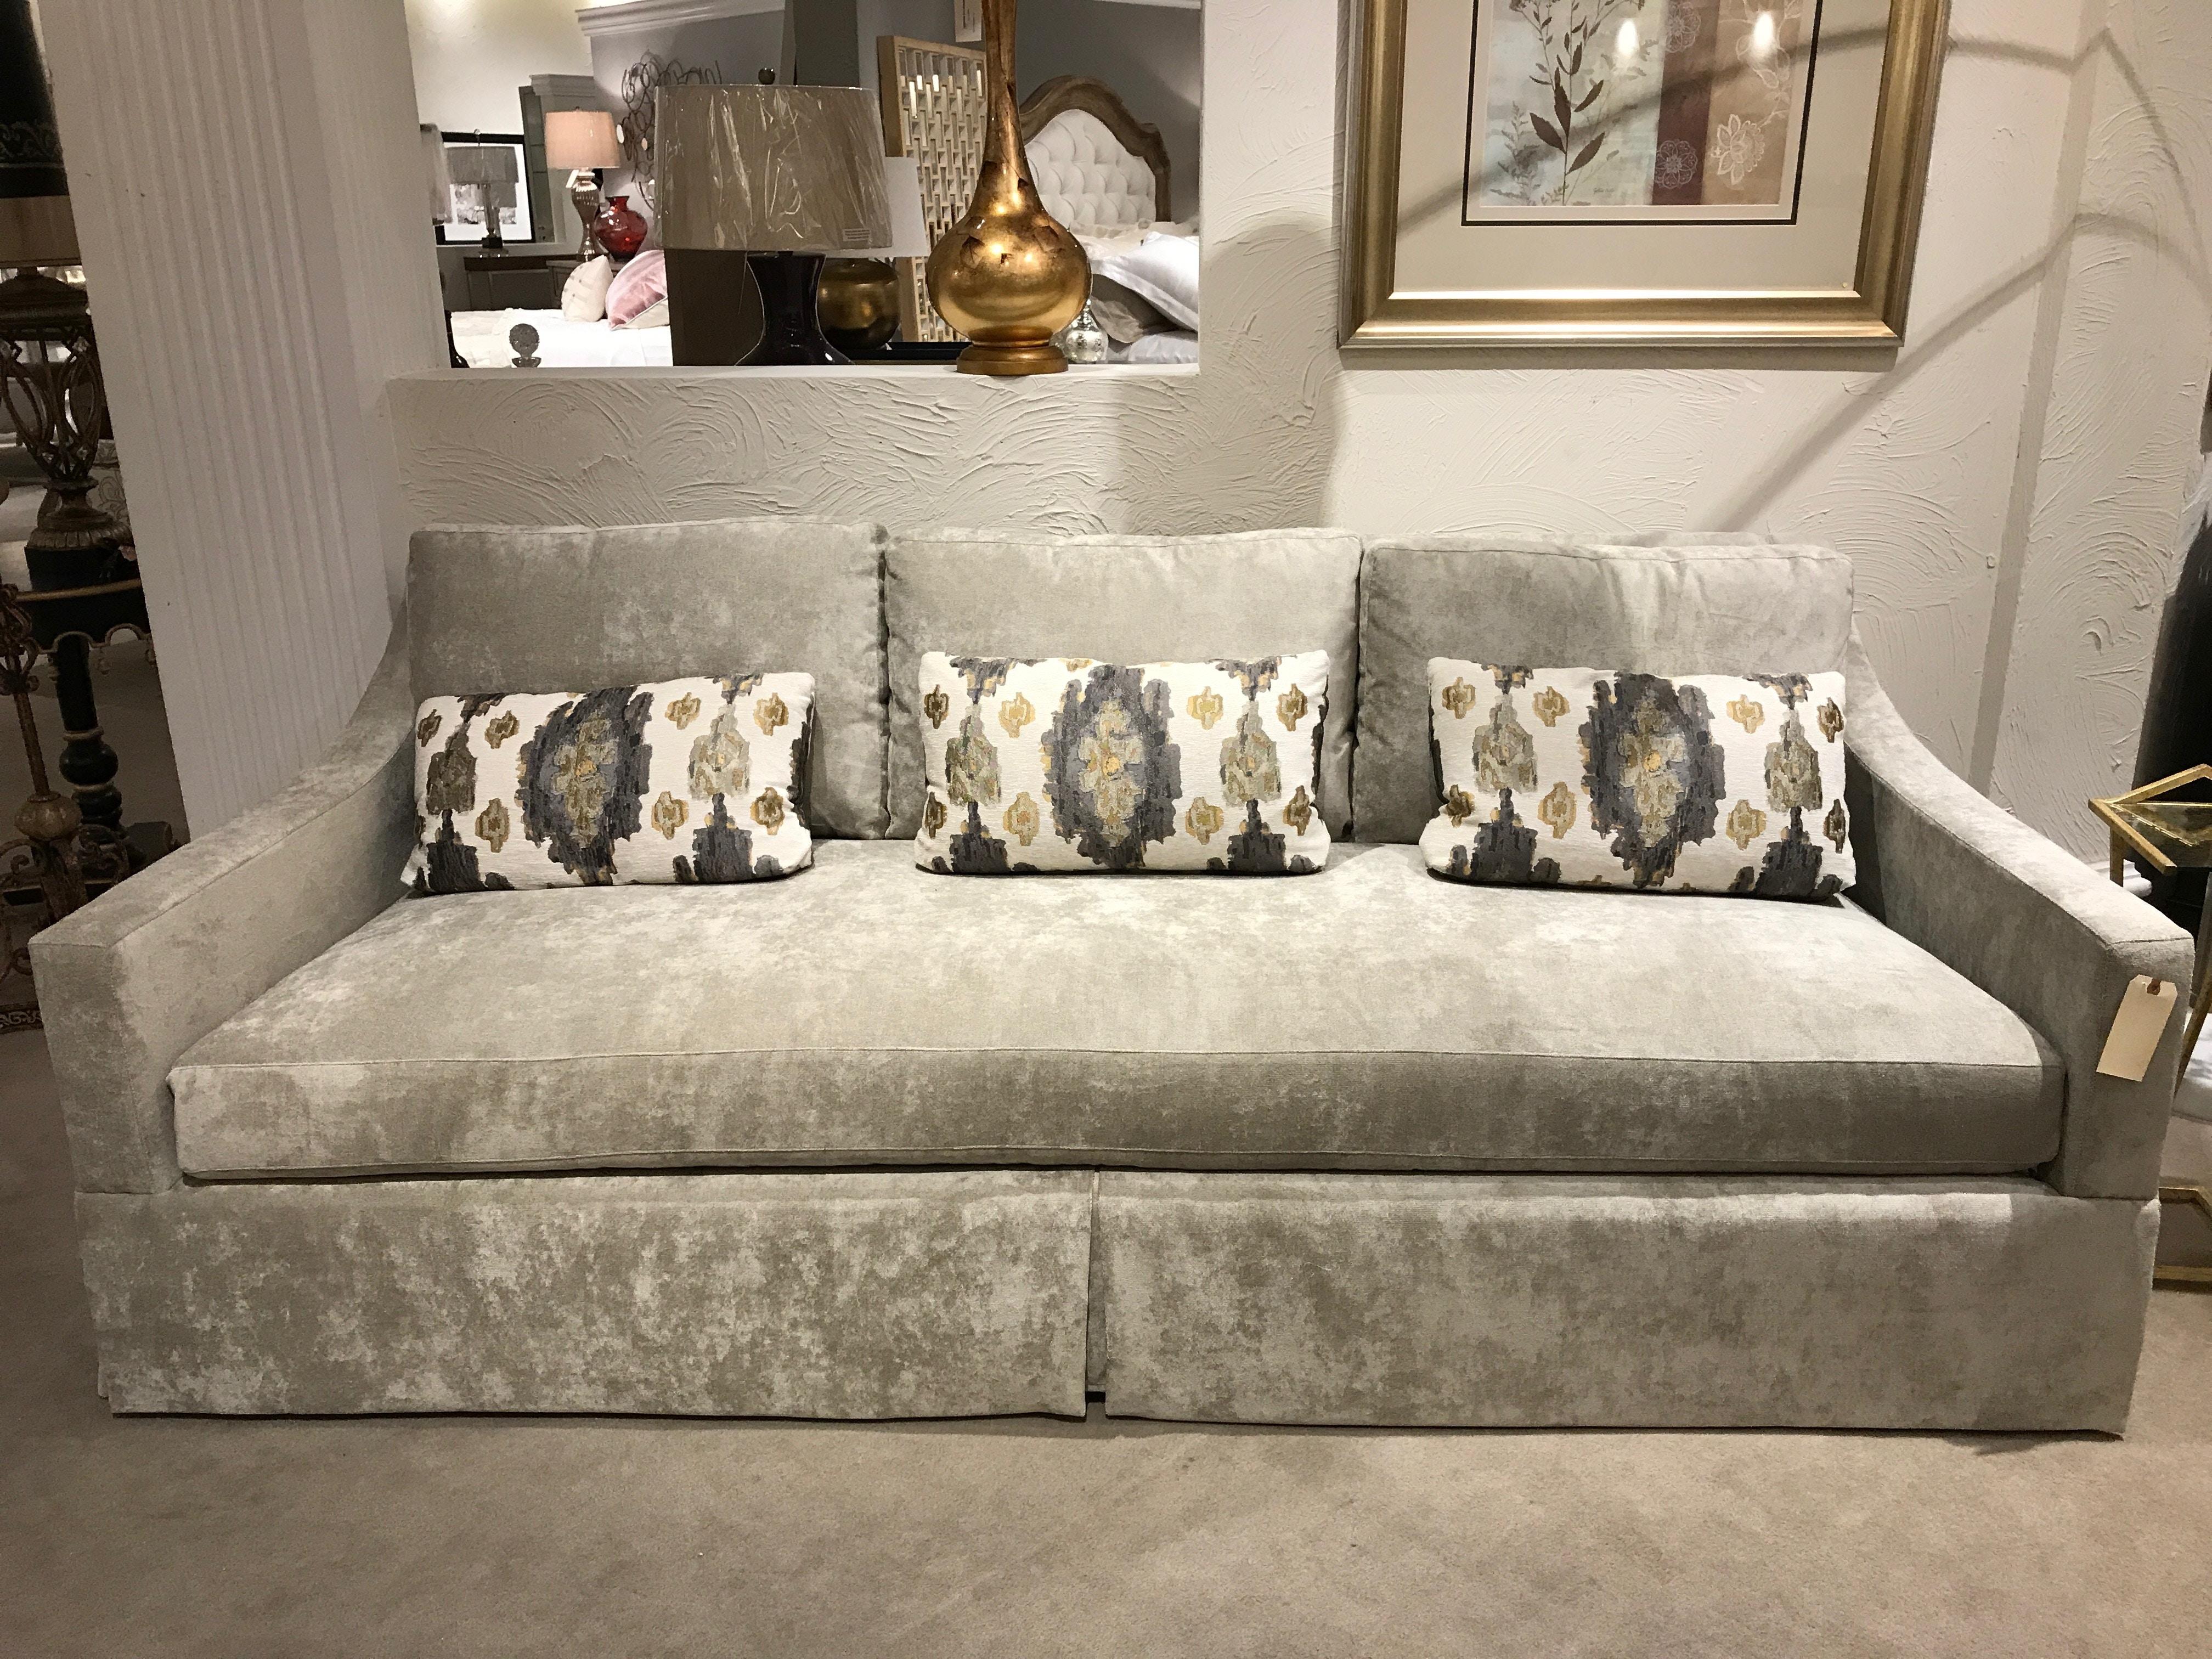 bernhardt sofas leather reclining sofa loveseat sets living room 132371 norwood furniture